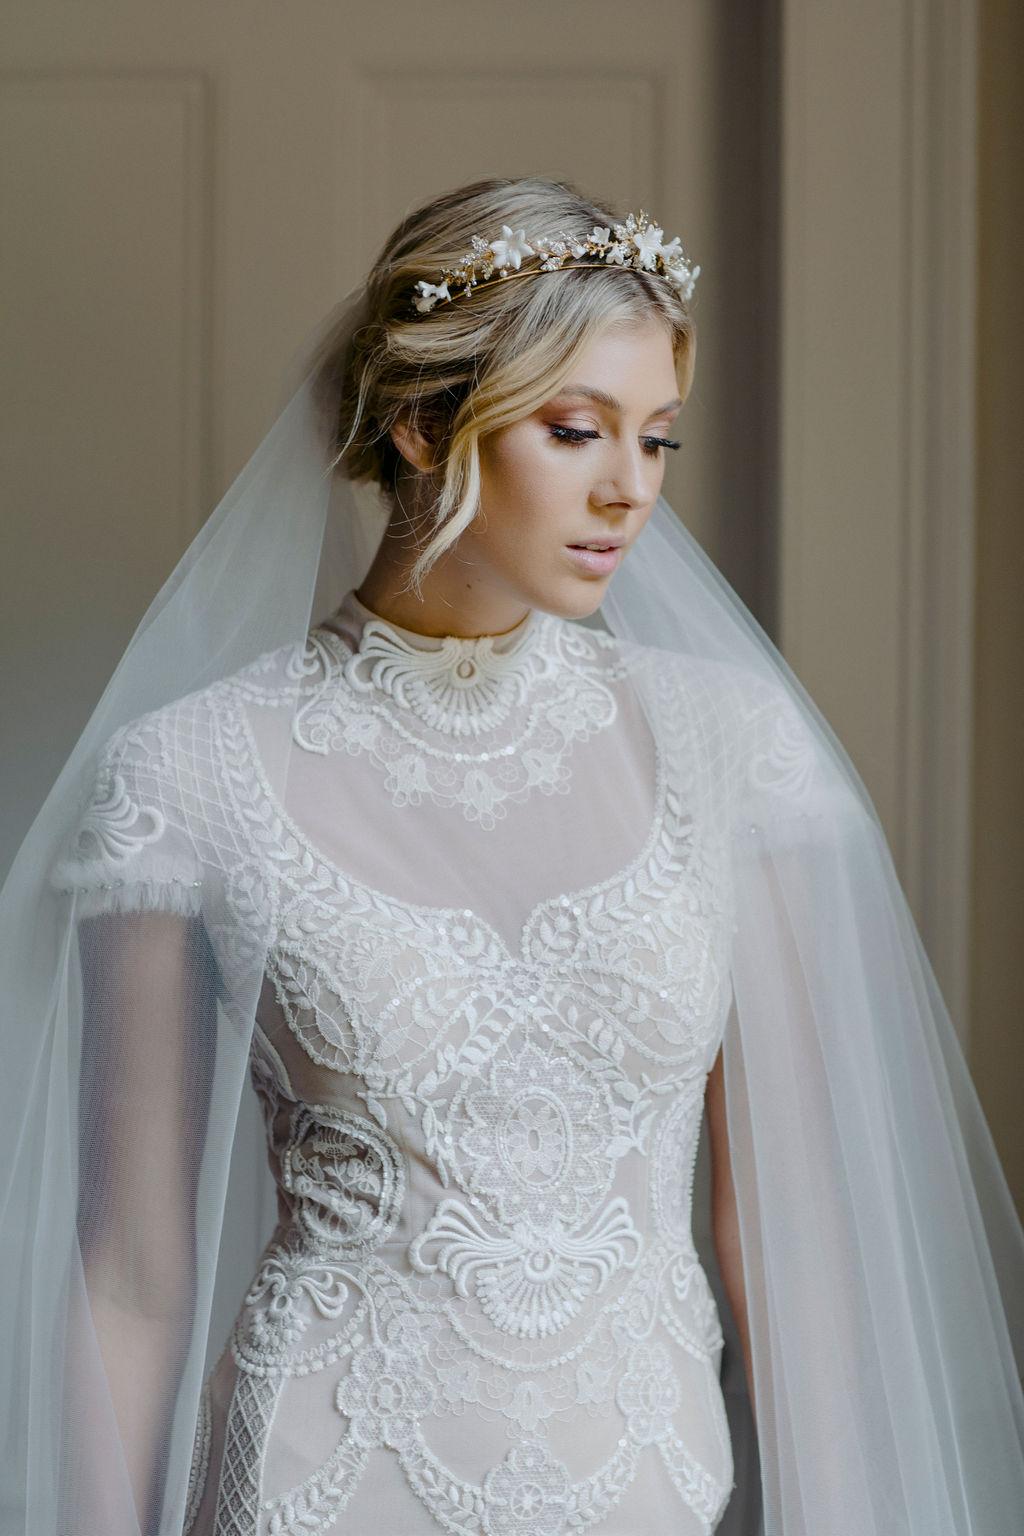 MARIETTE | WEDDING TIARA WITH CRYSTALS by TANIA MARAS